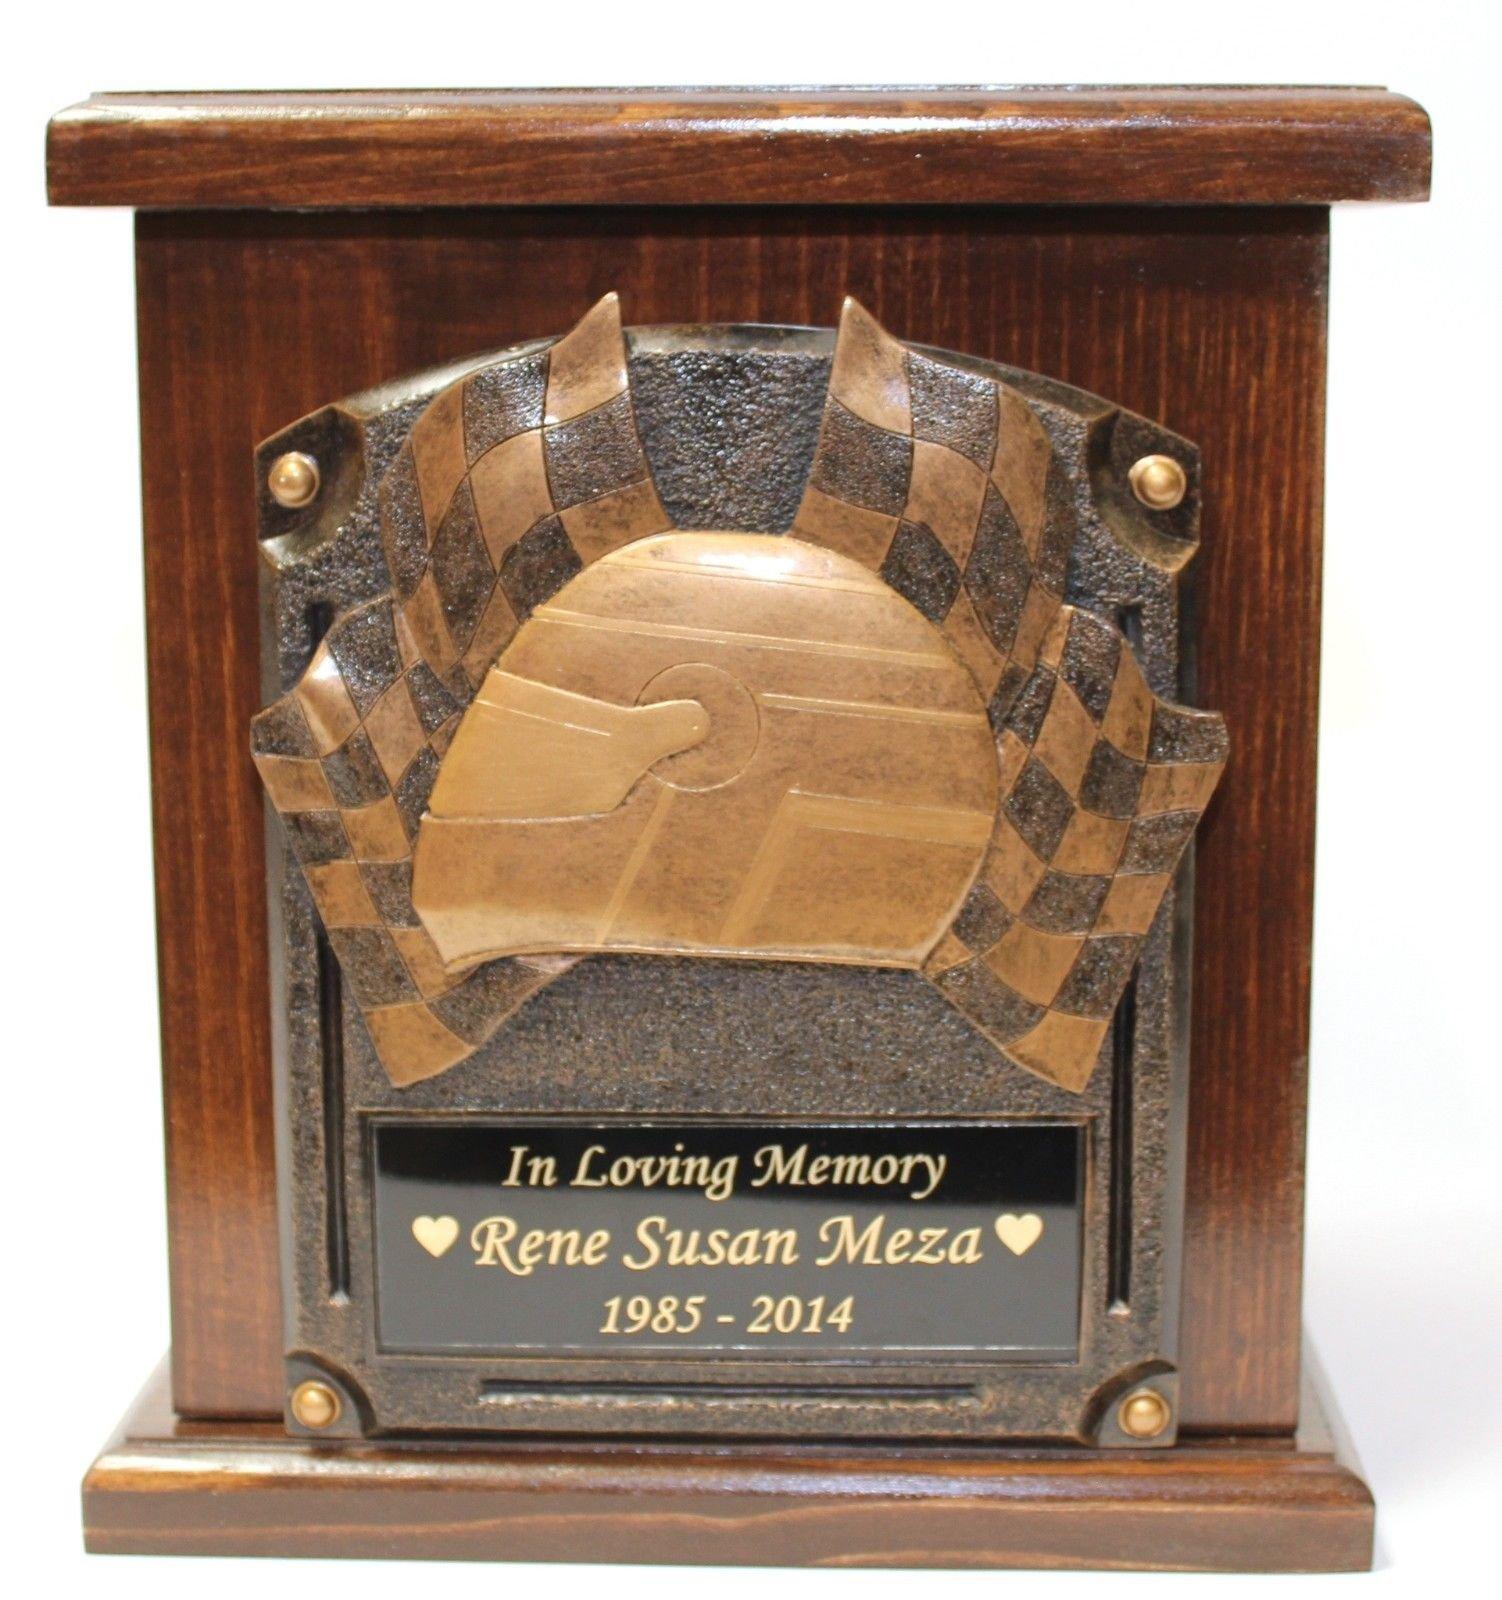 Racing,biker,motorcycle,car NASCAR funeral cremation urn,adult wood memorial urn